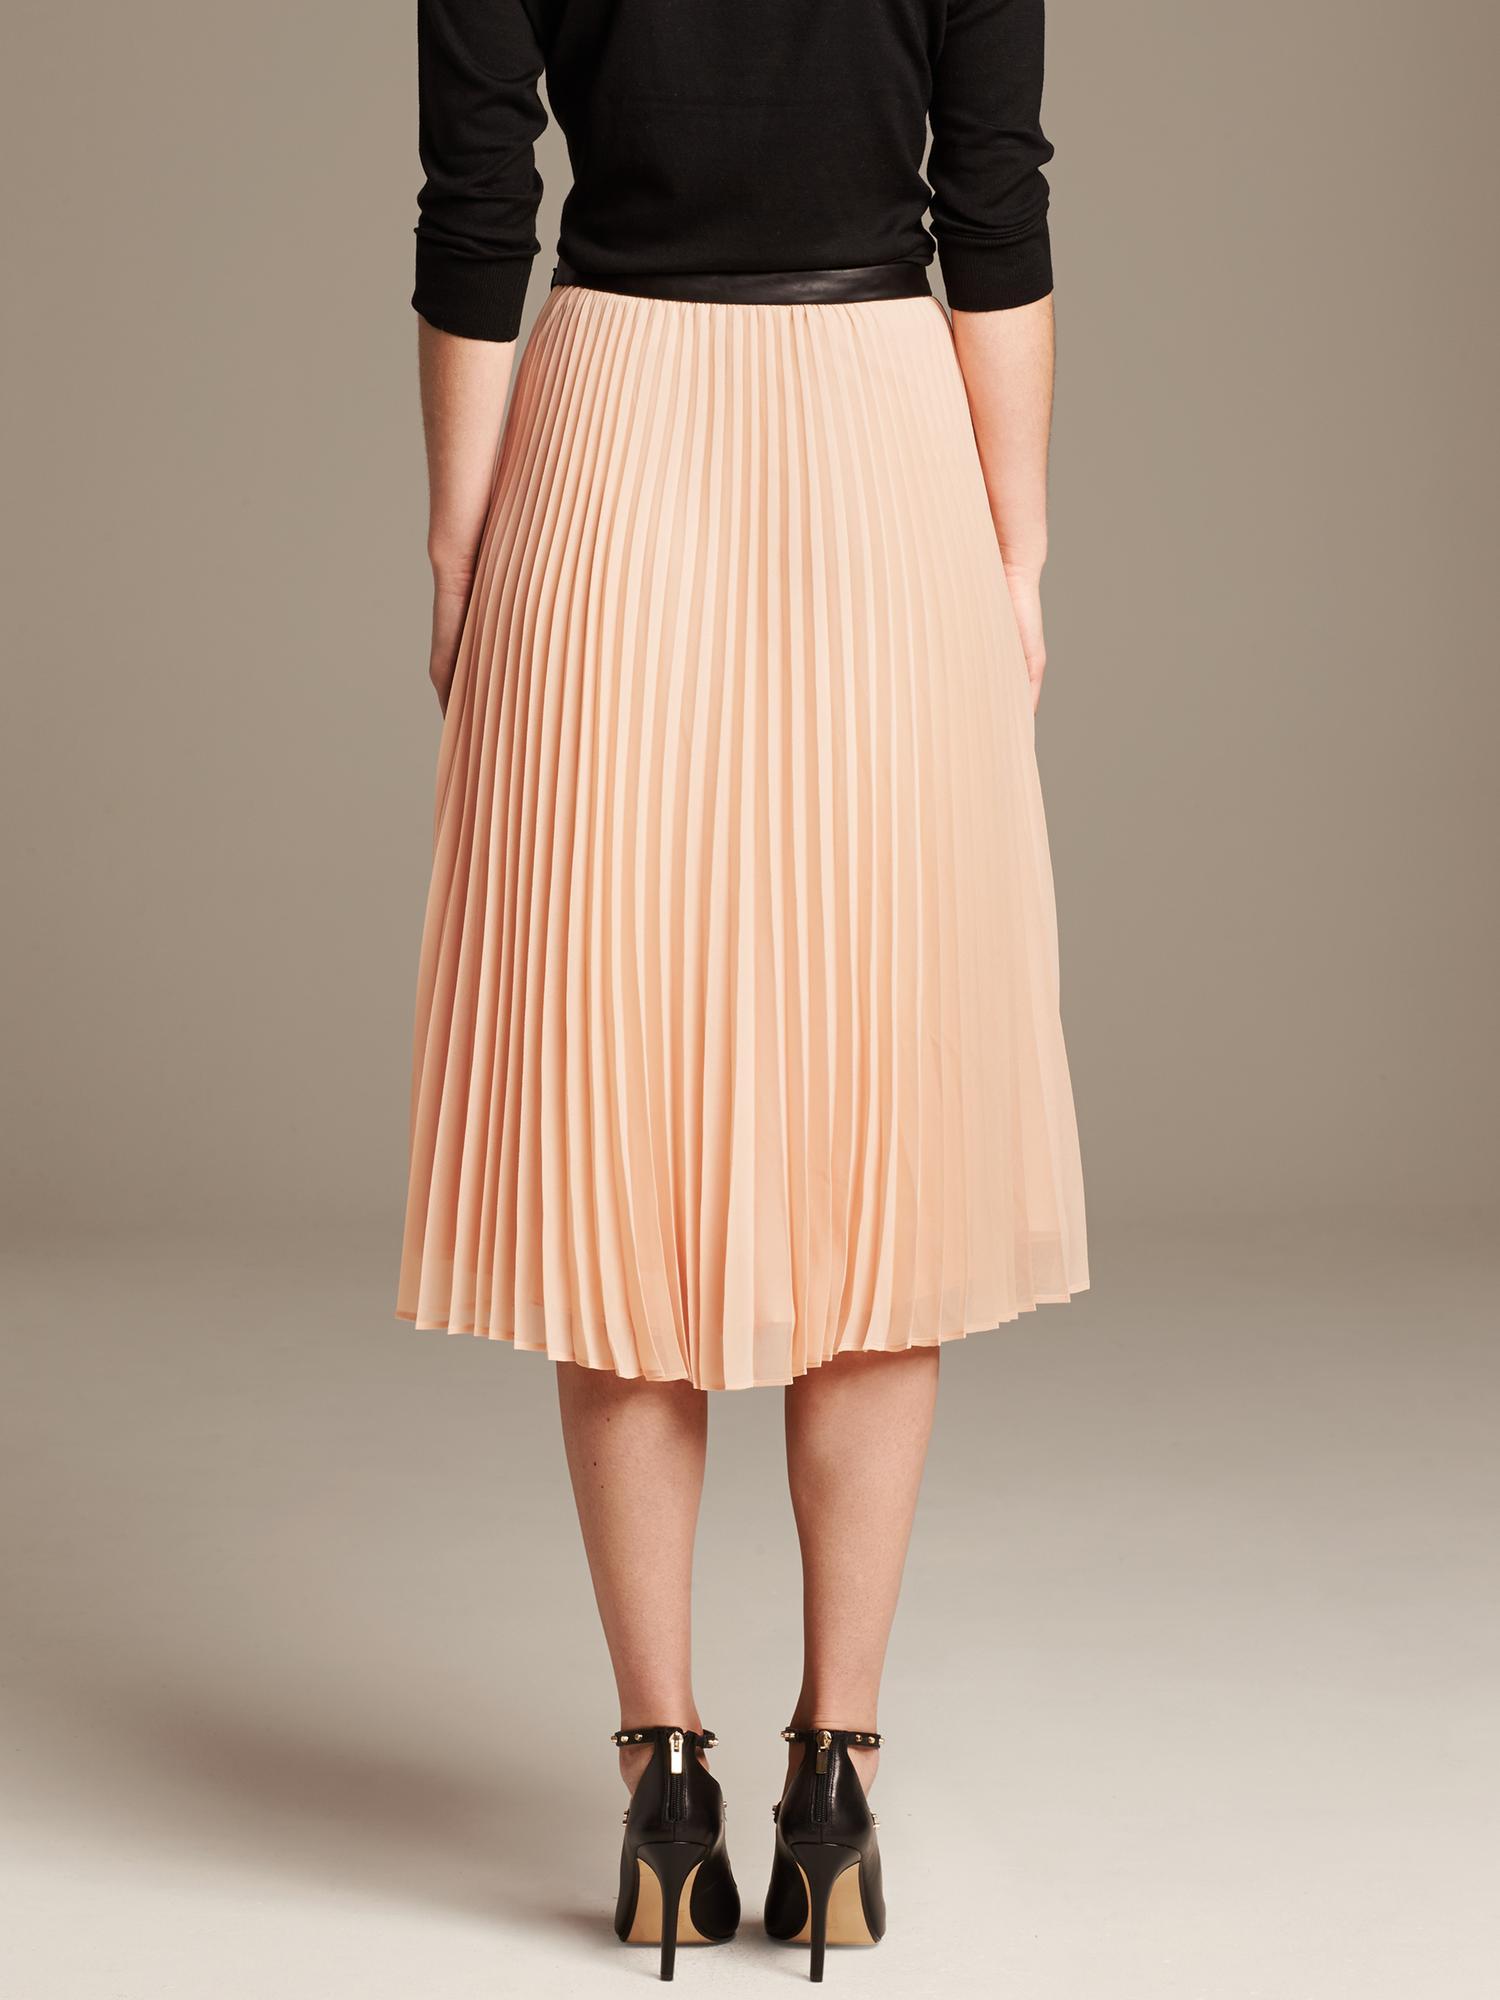 99f61604e2 Banana Republic Pleated Chiffon Midi Skirt in Pink - Lyst